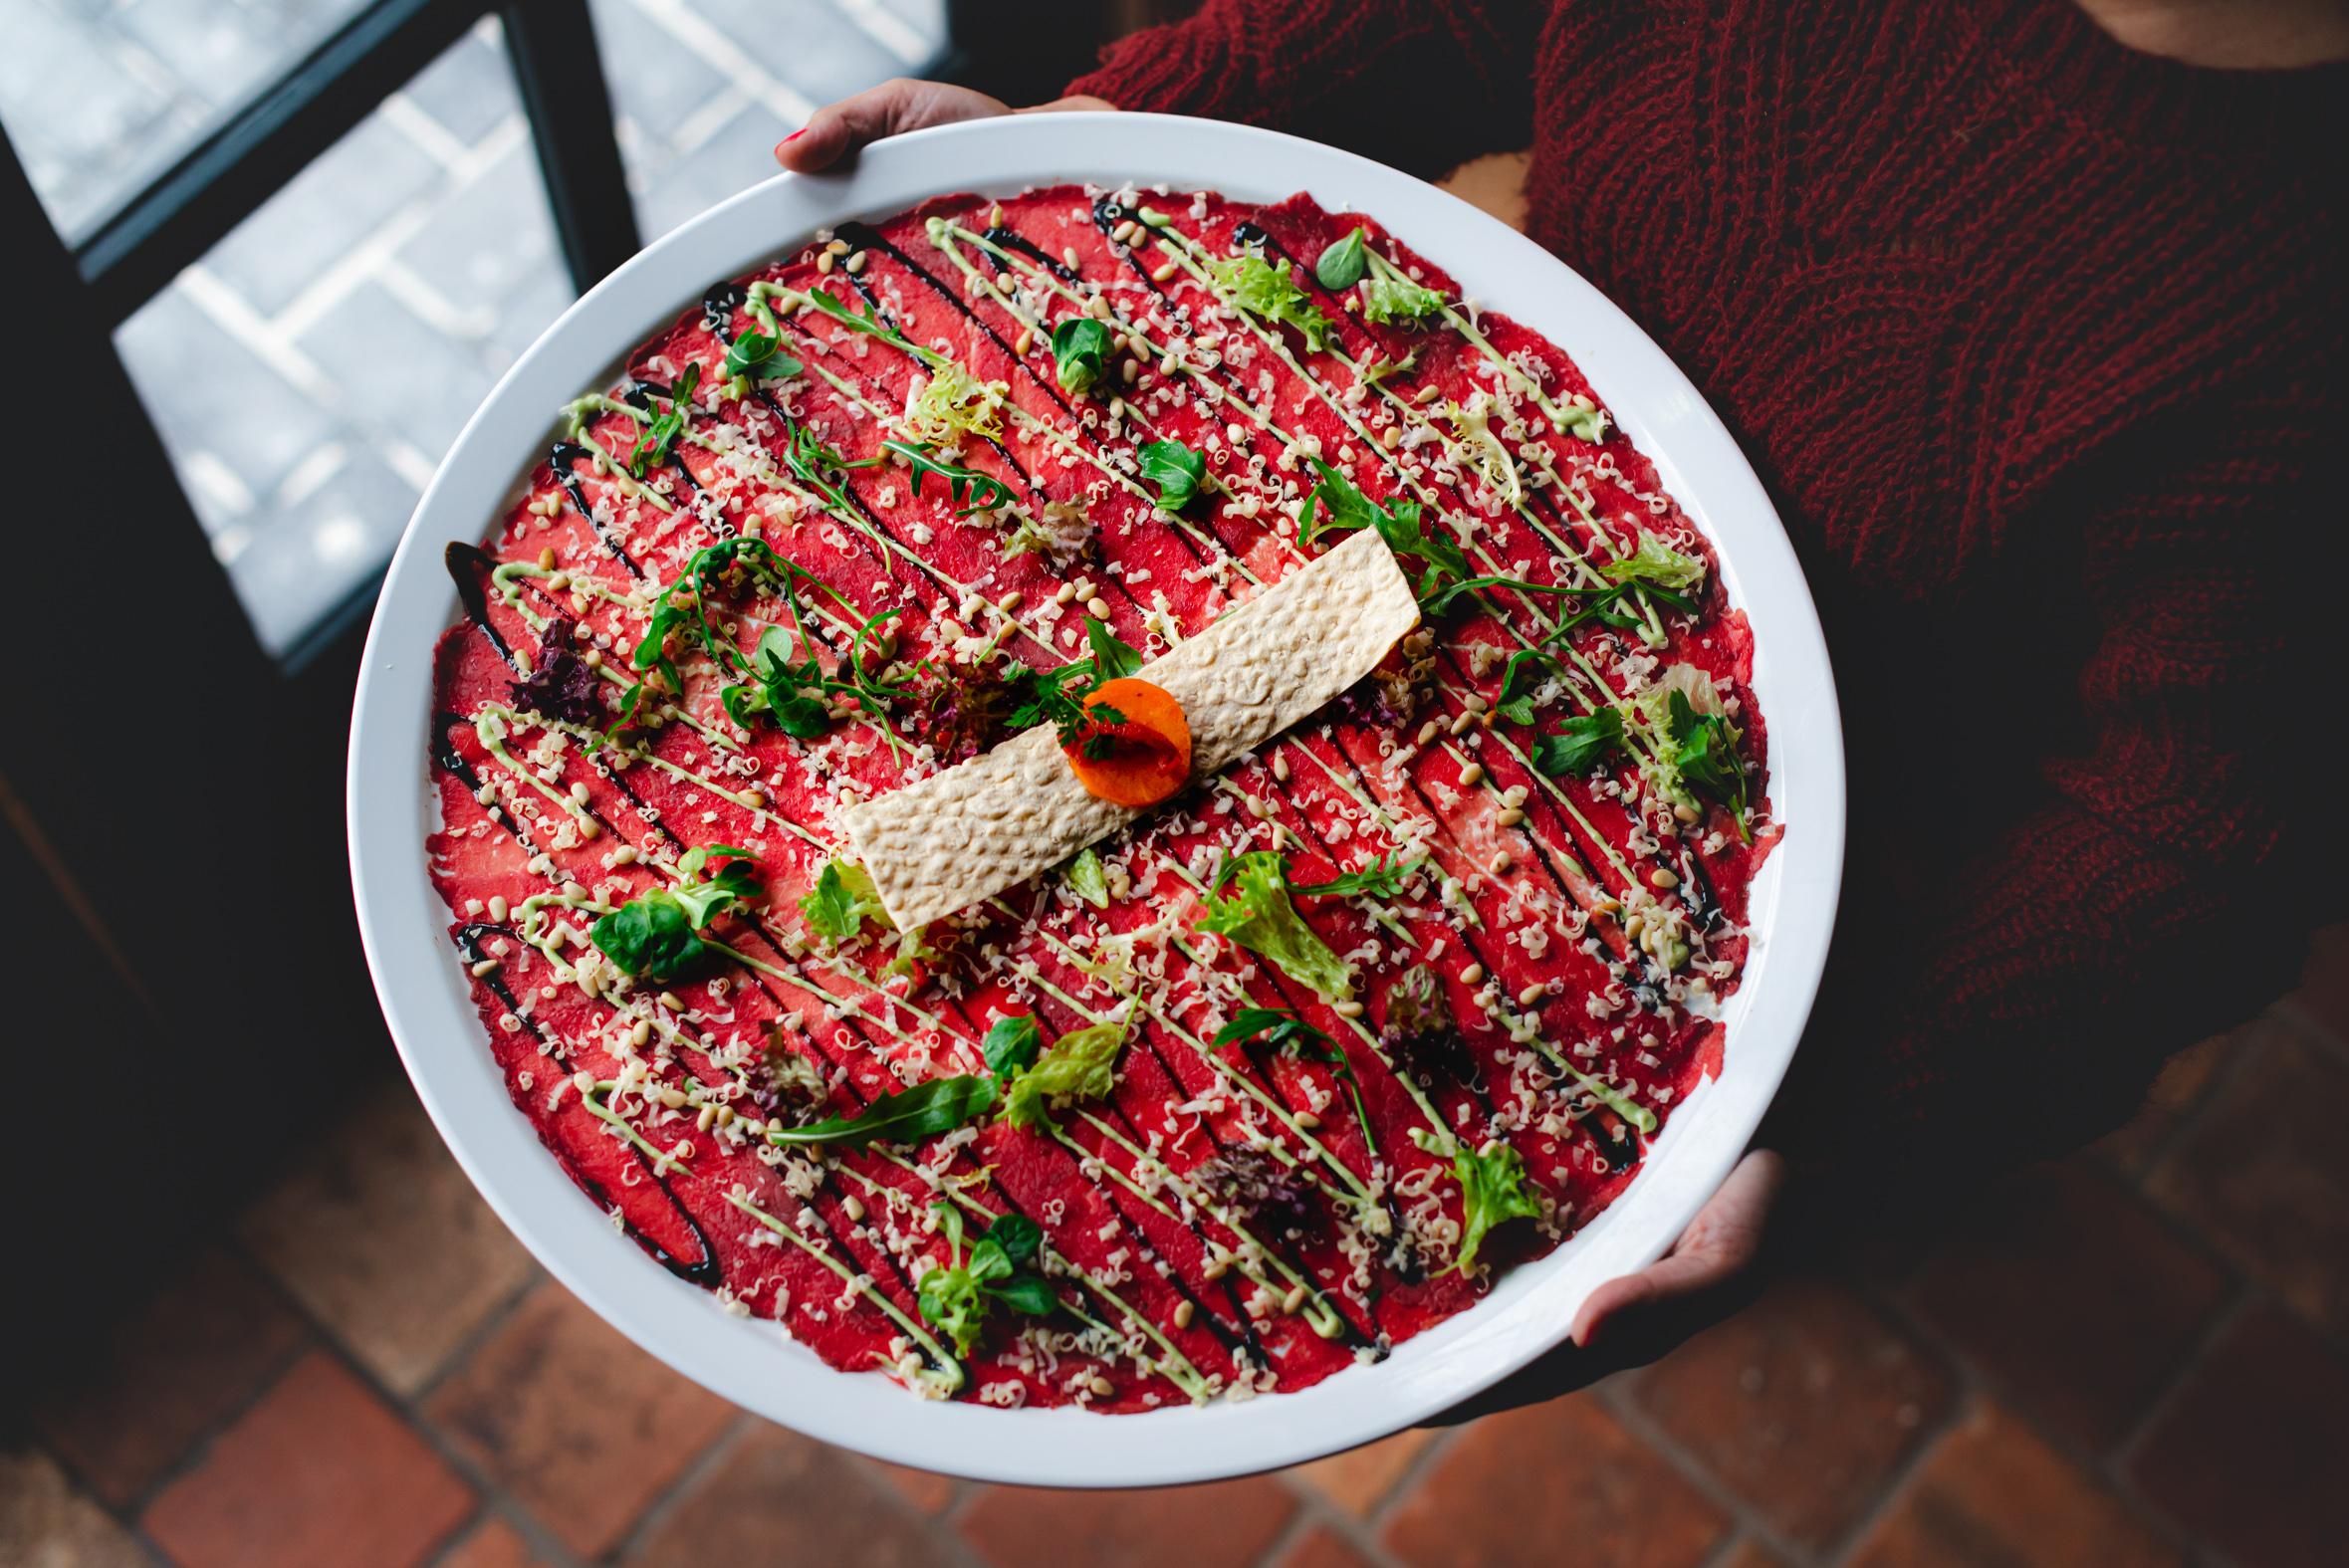 Carpaccio Bistro de Kruidentuin - Stefanie Spoelder roodfotografie - Food Photography